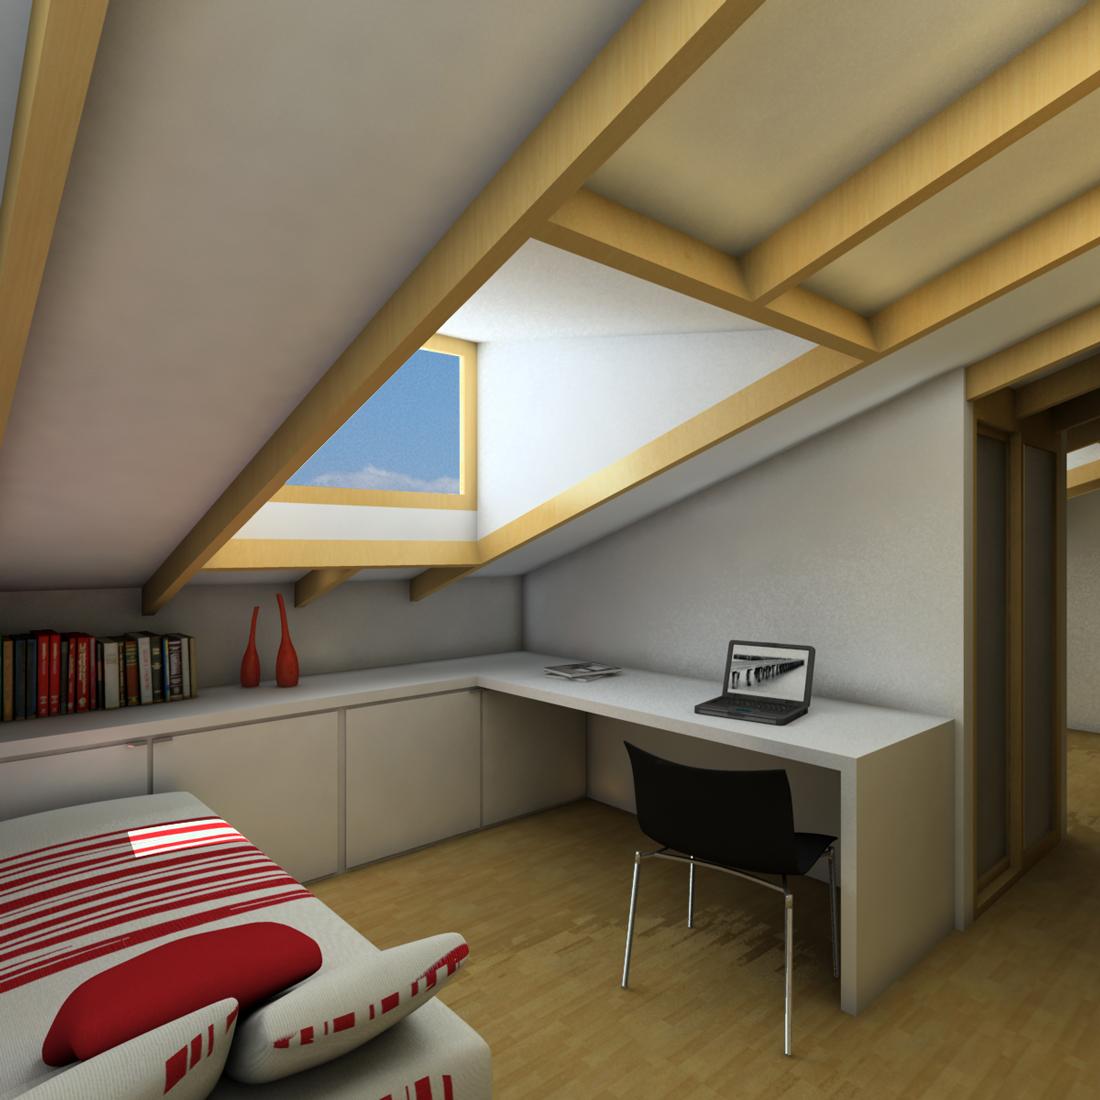 05_dormitorio01